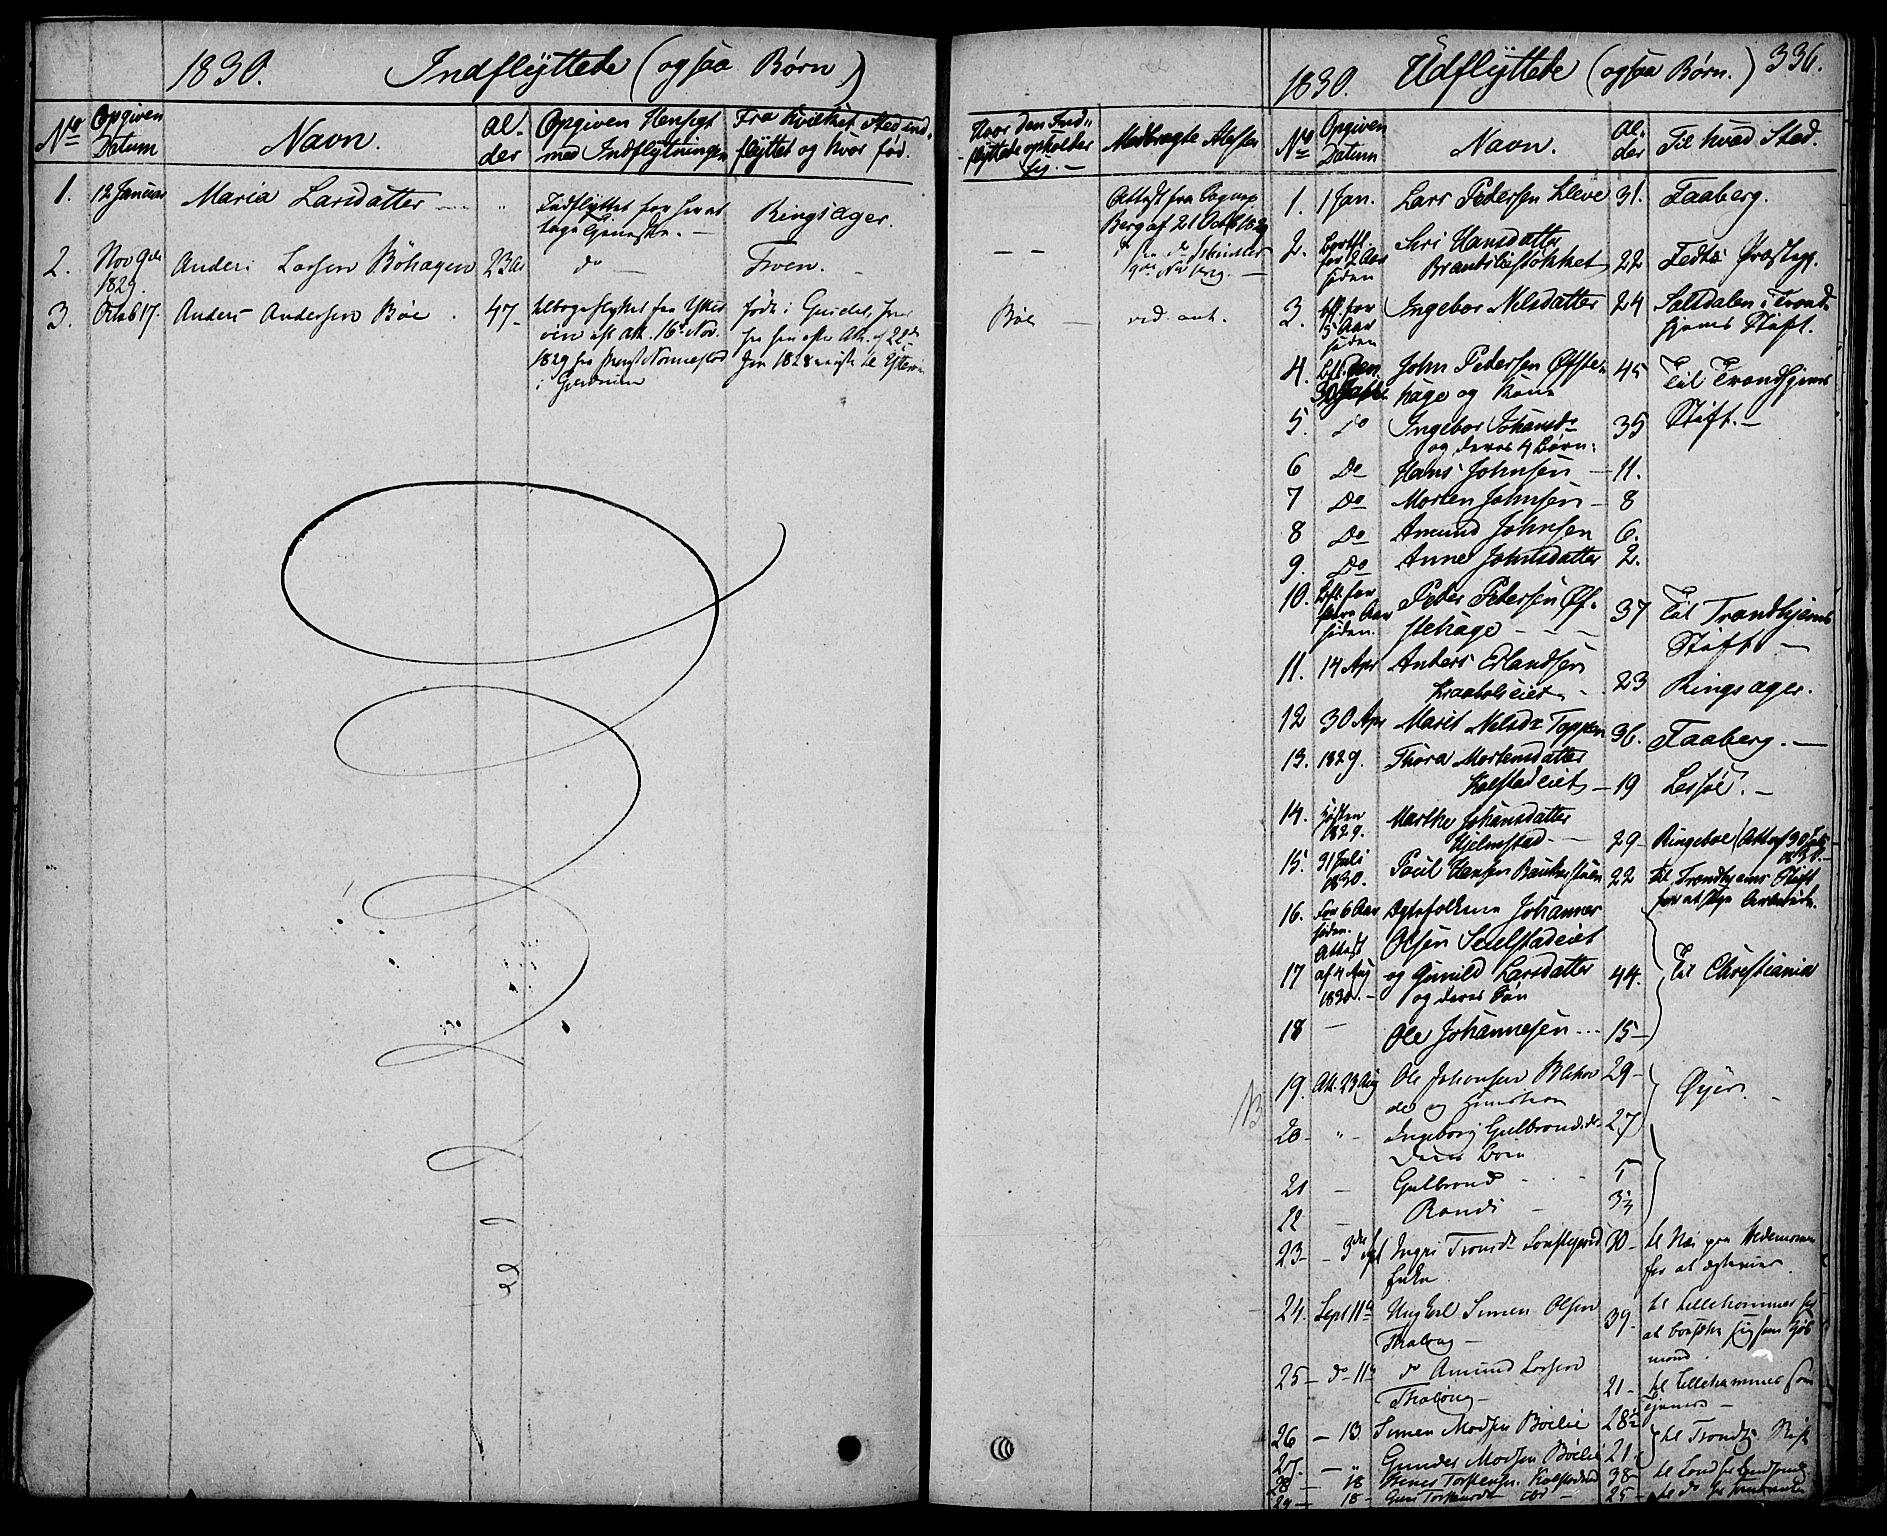 SAH, Gausdal prestekontor, Ministerialbok nr. 6, 1830-1839, s. 336